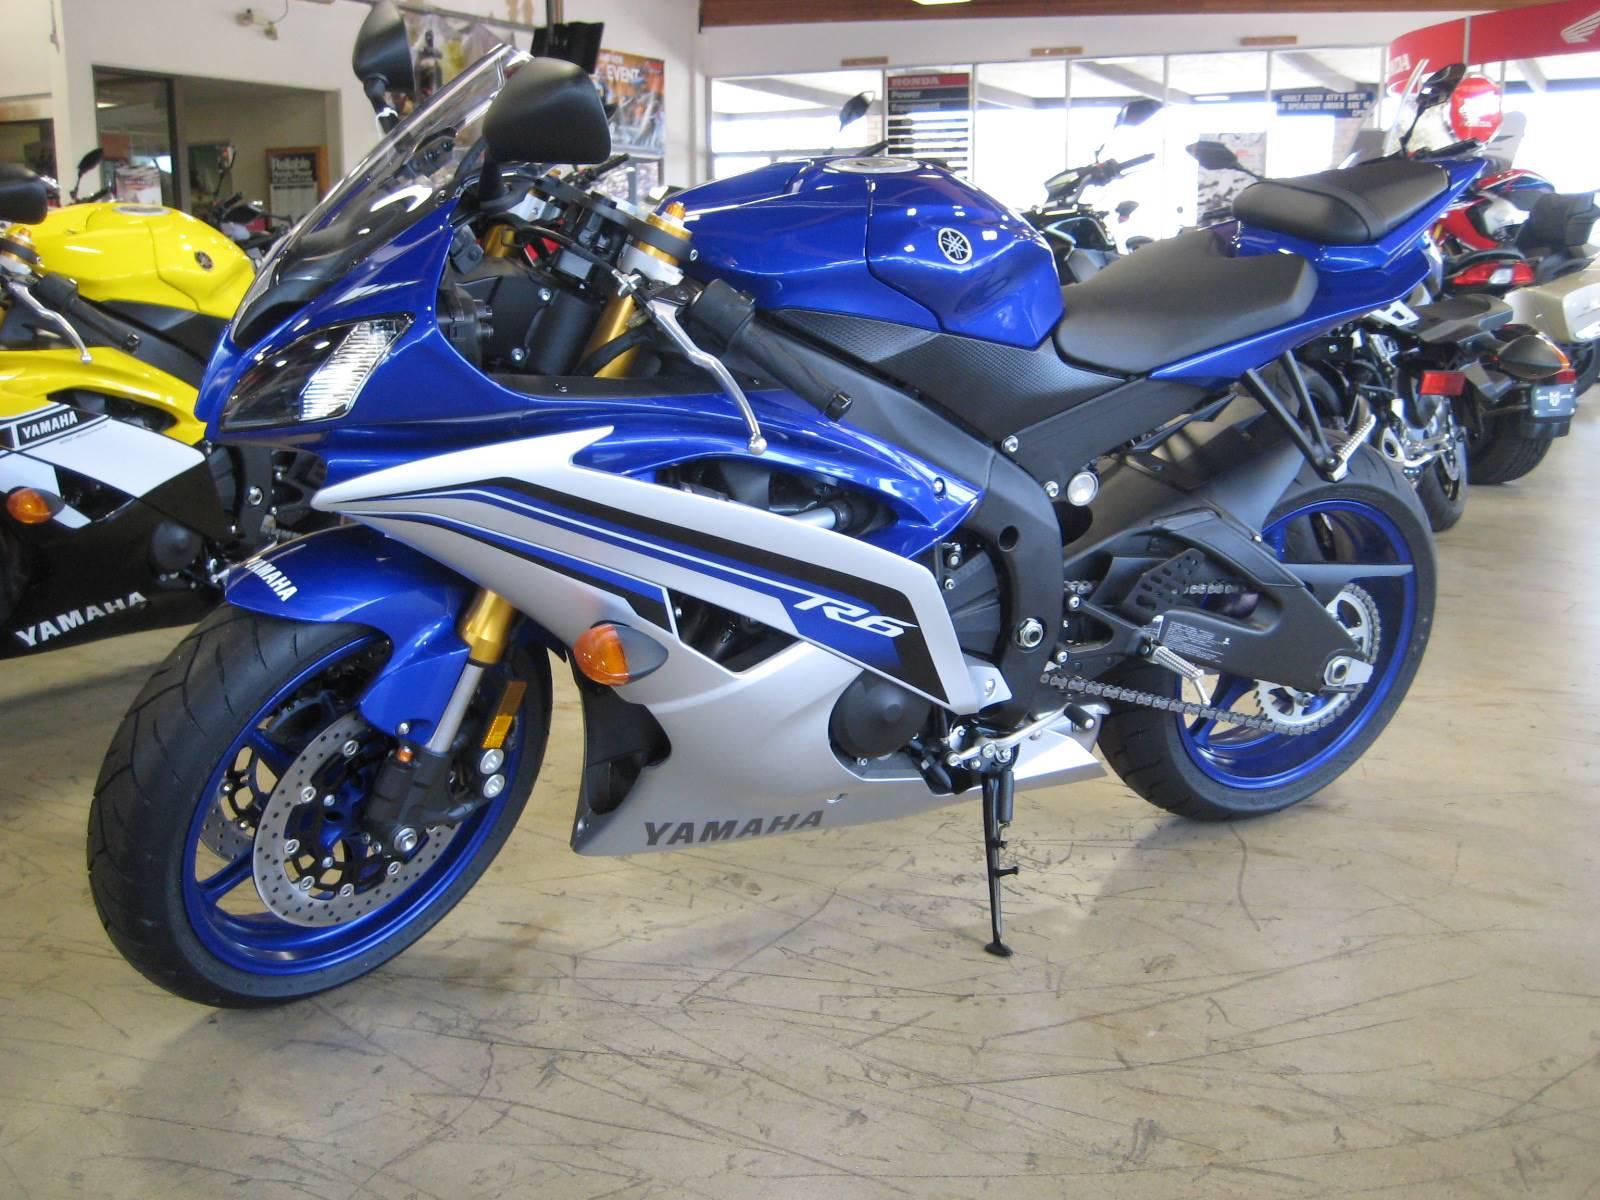 2016 Yamaha YZF-R6 for sale 2069